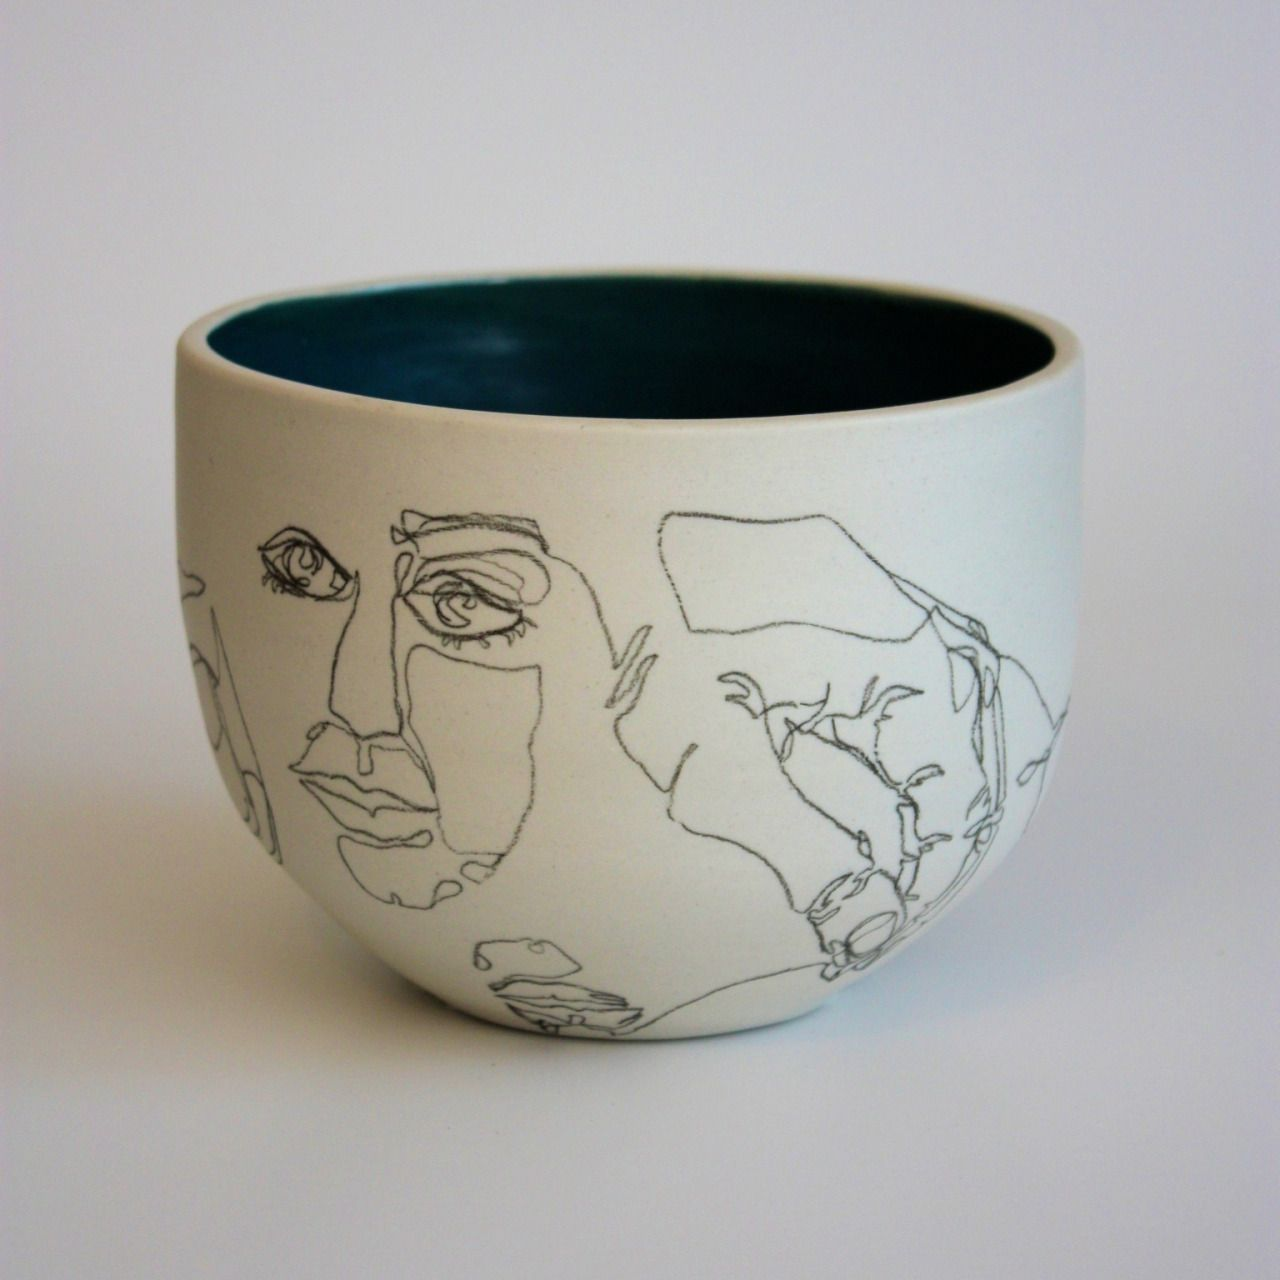 New ceramic work porcelain underglaze pencil glazed interior